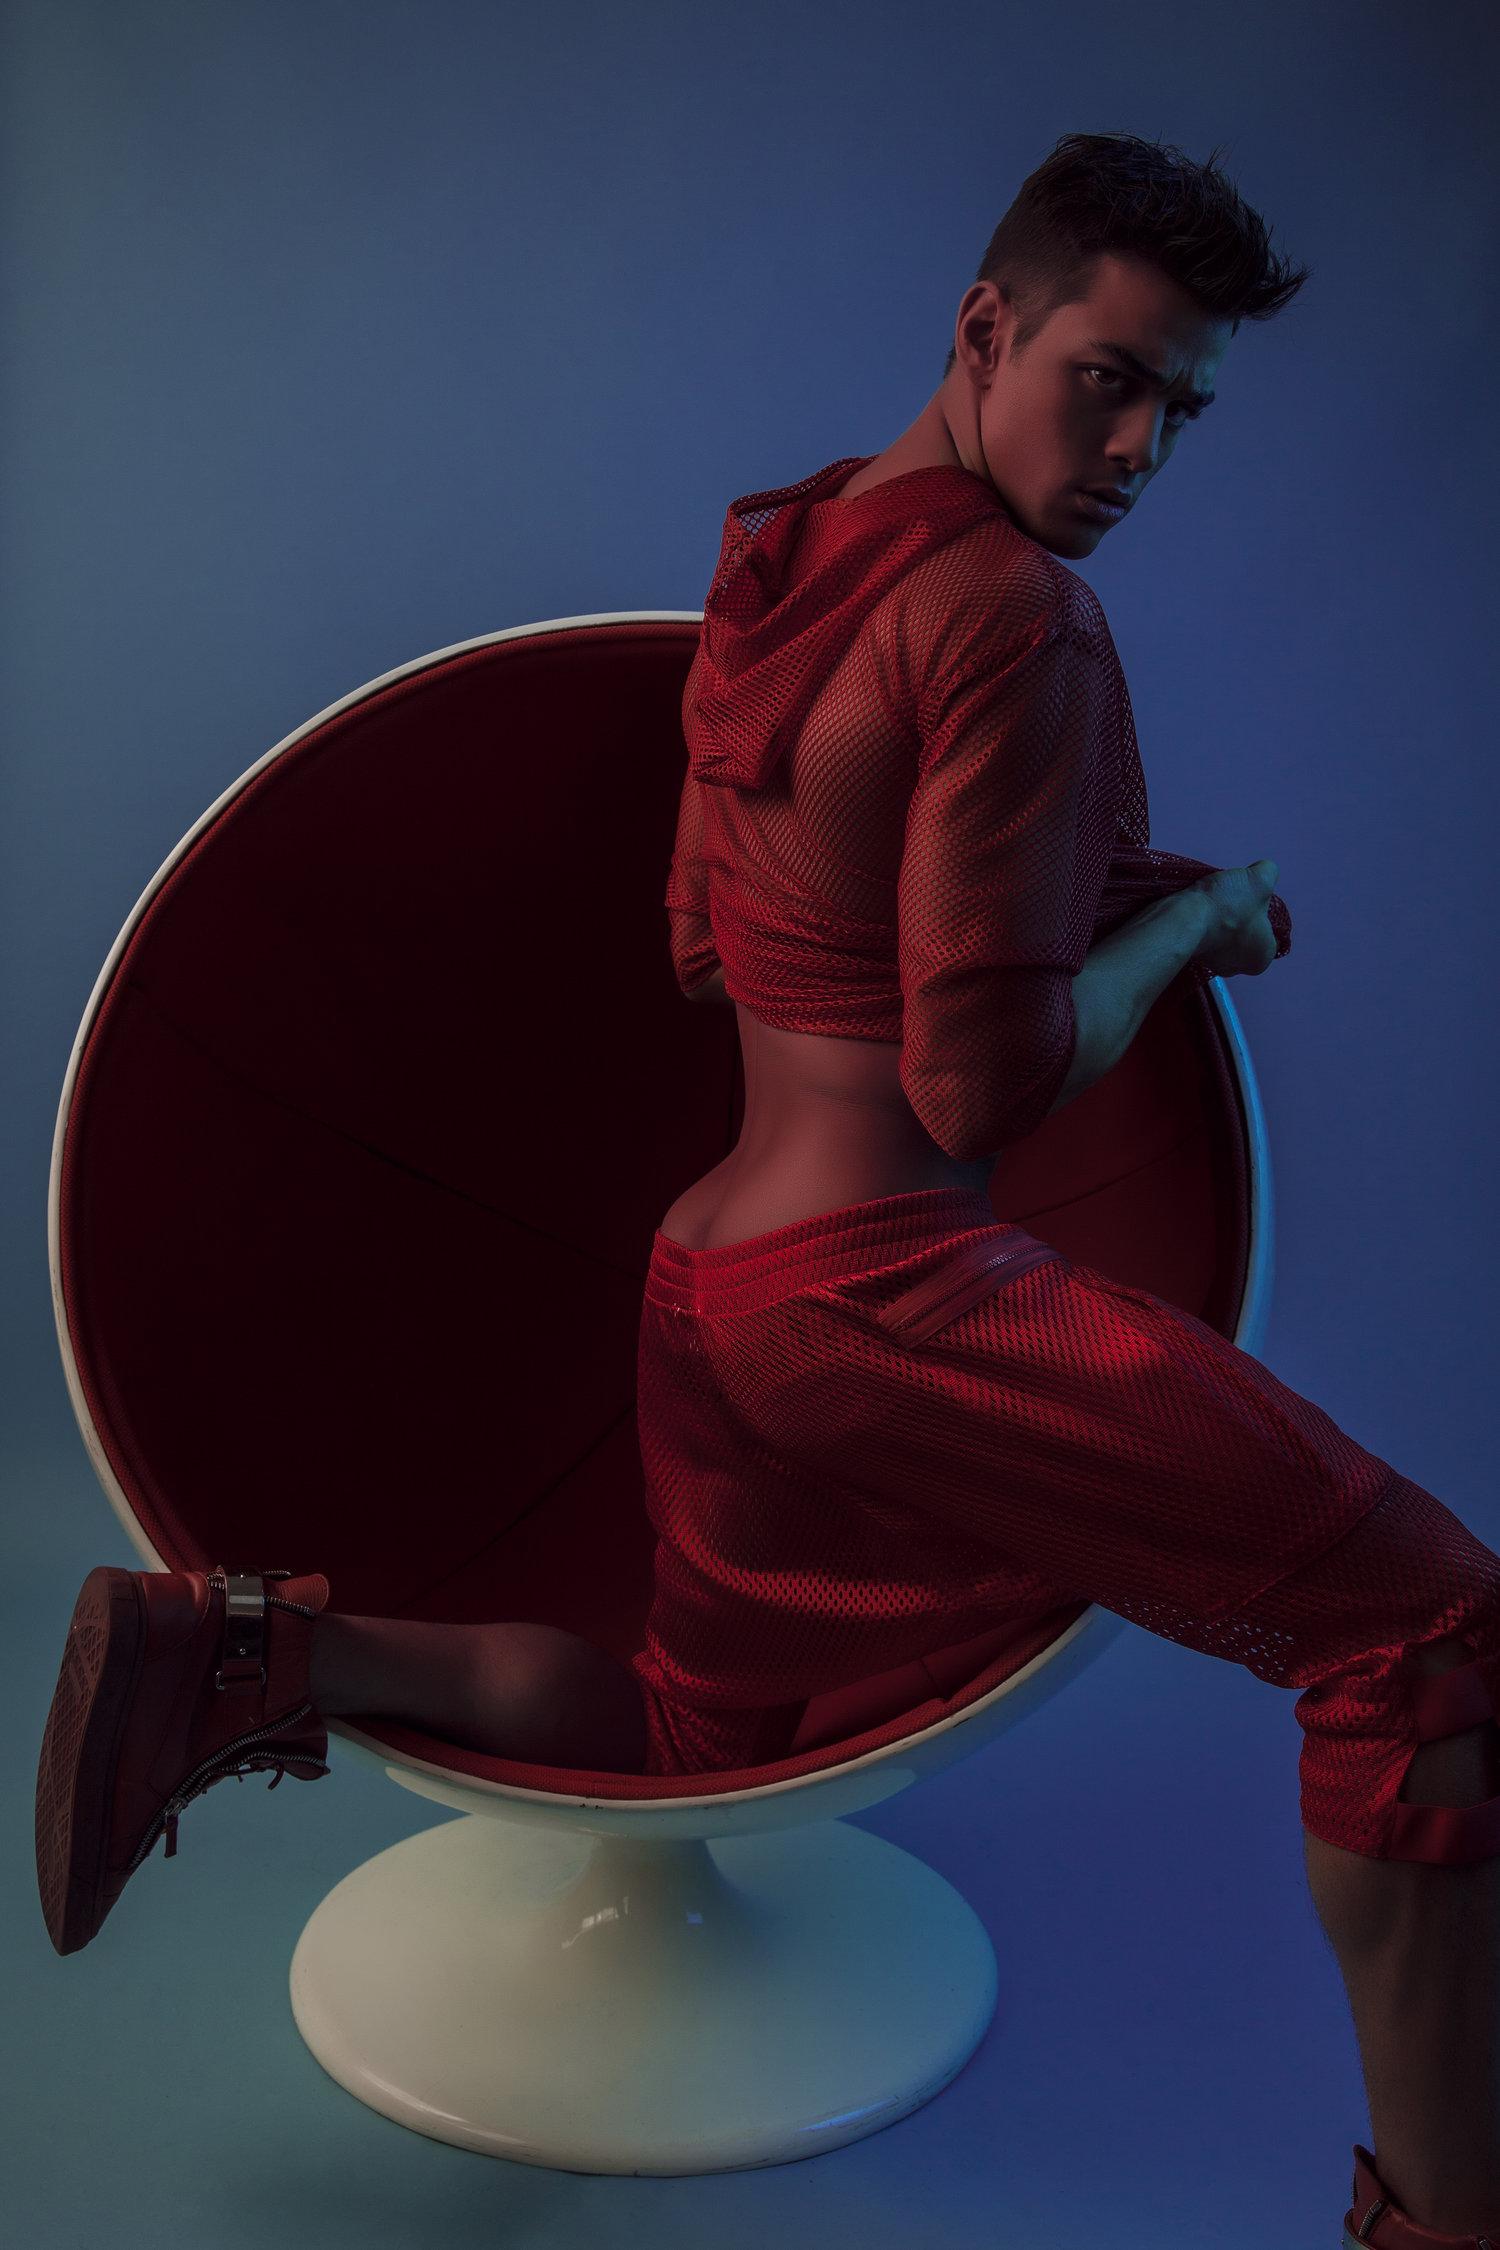 Adon Exclusive: Model Scott Gardner By Dalong Yang